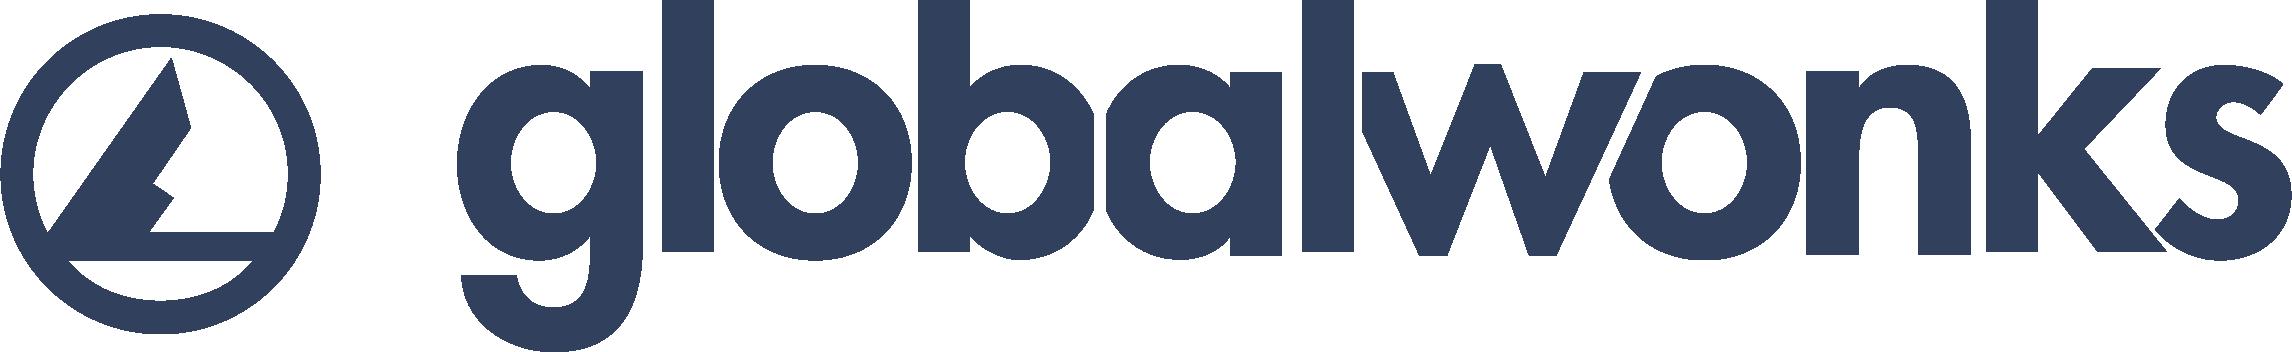 GW-rectangular-color-20170721-r1 (1).png